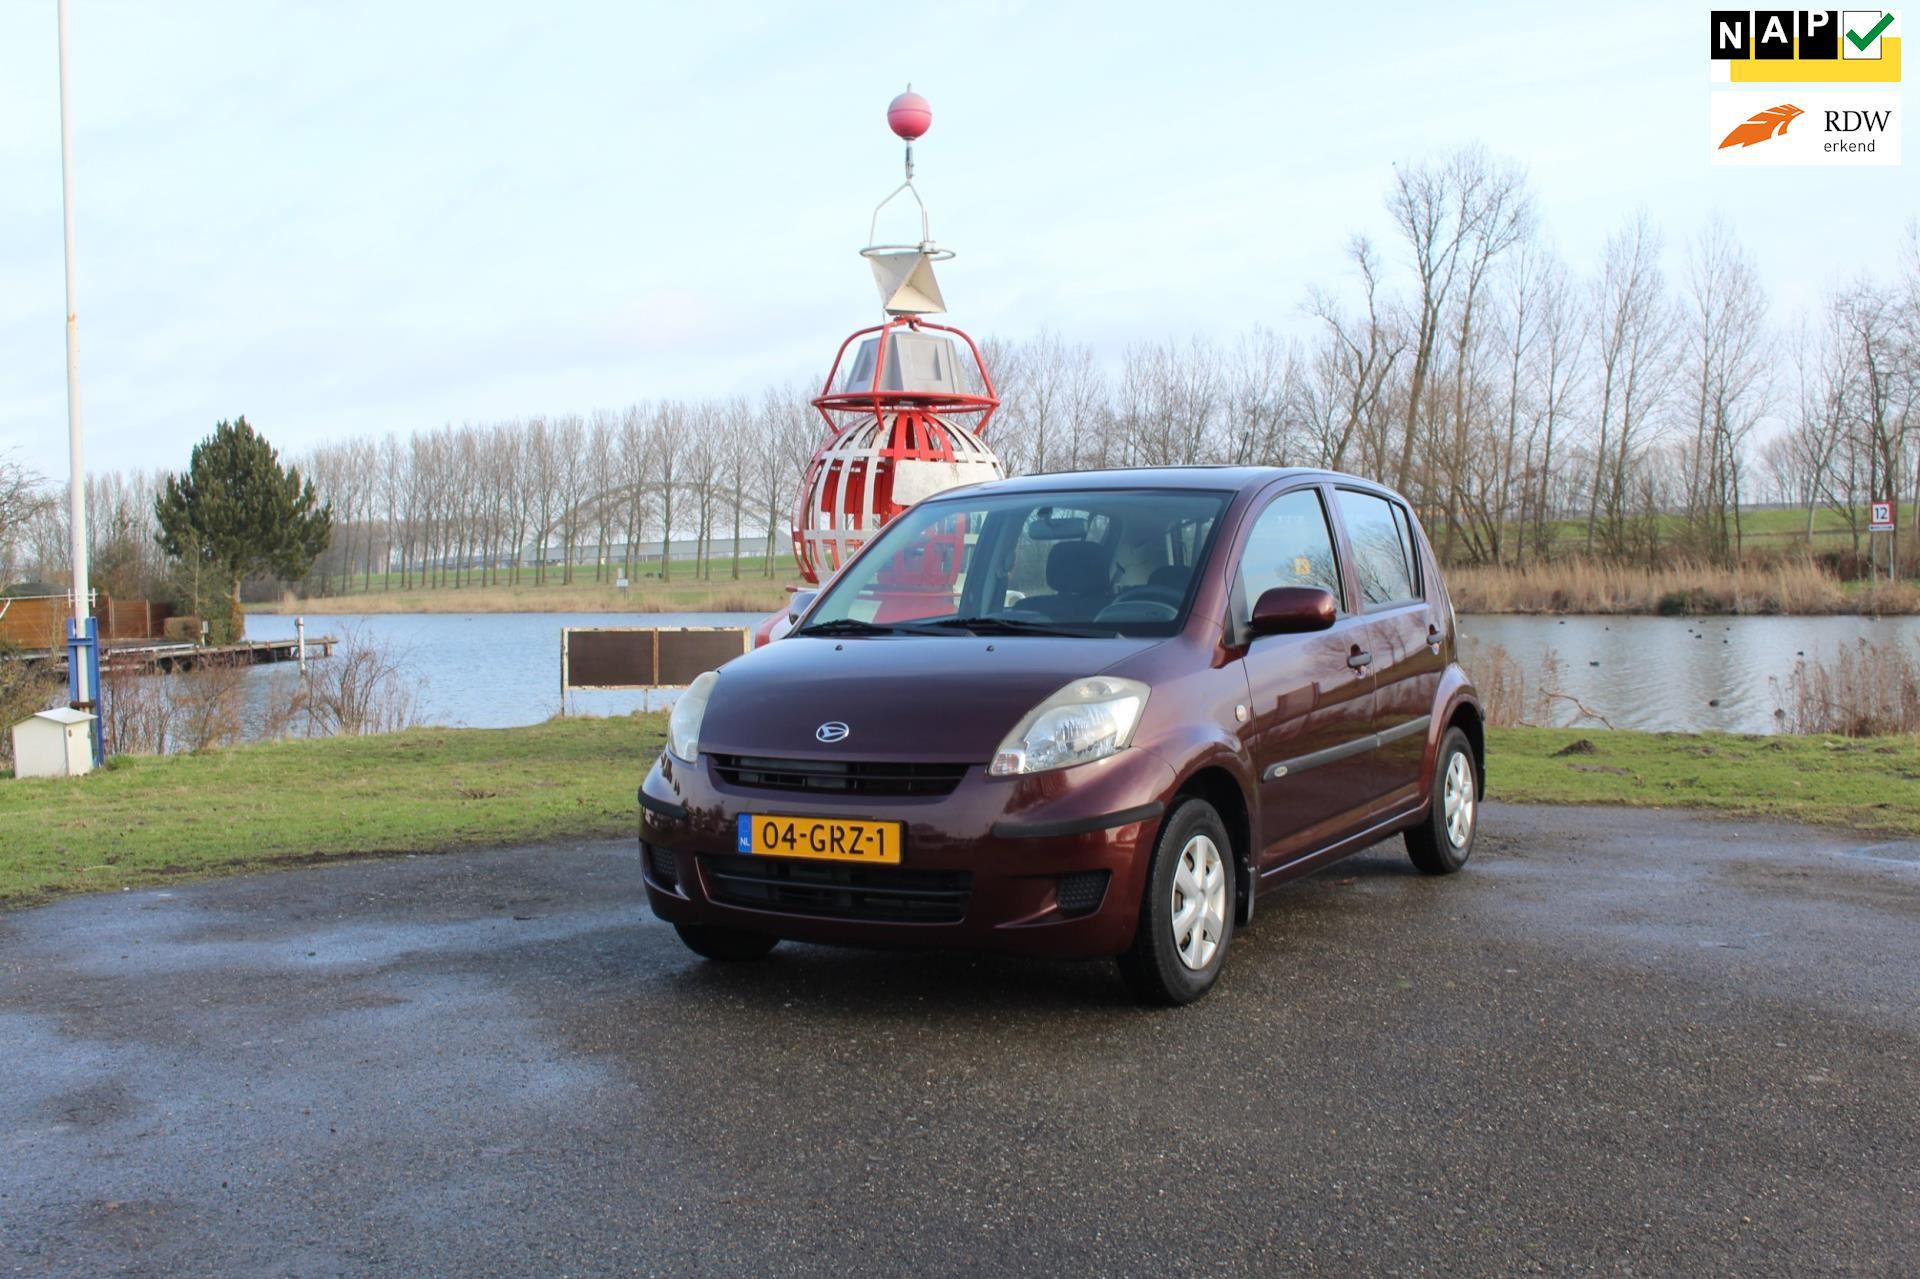 Daihatsu Sirion 2 occasion - Van Vliet Auto's